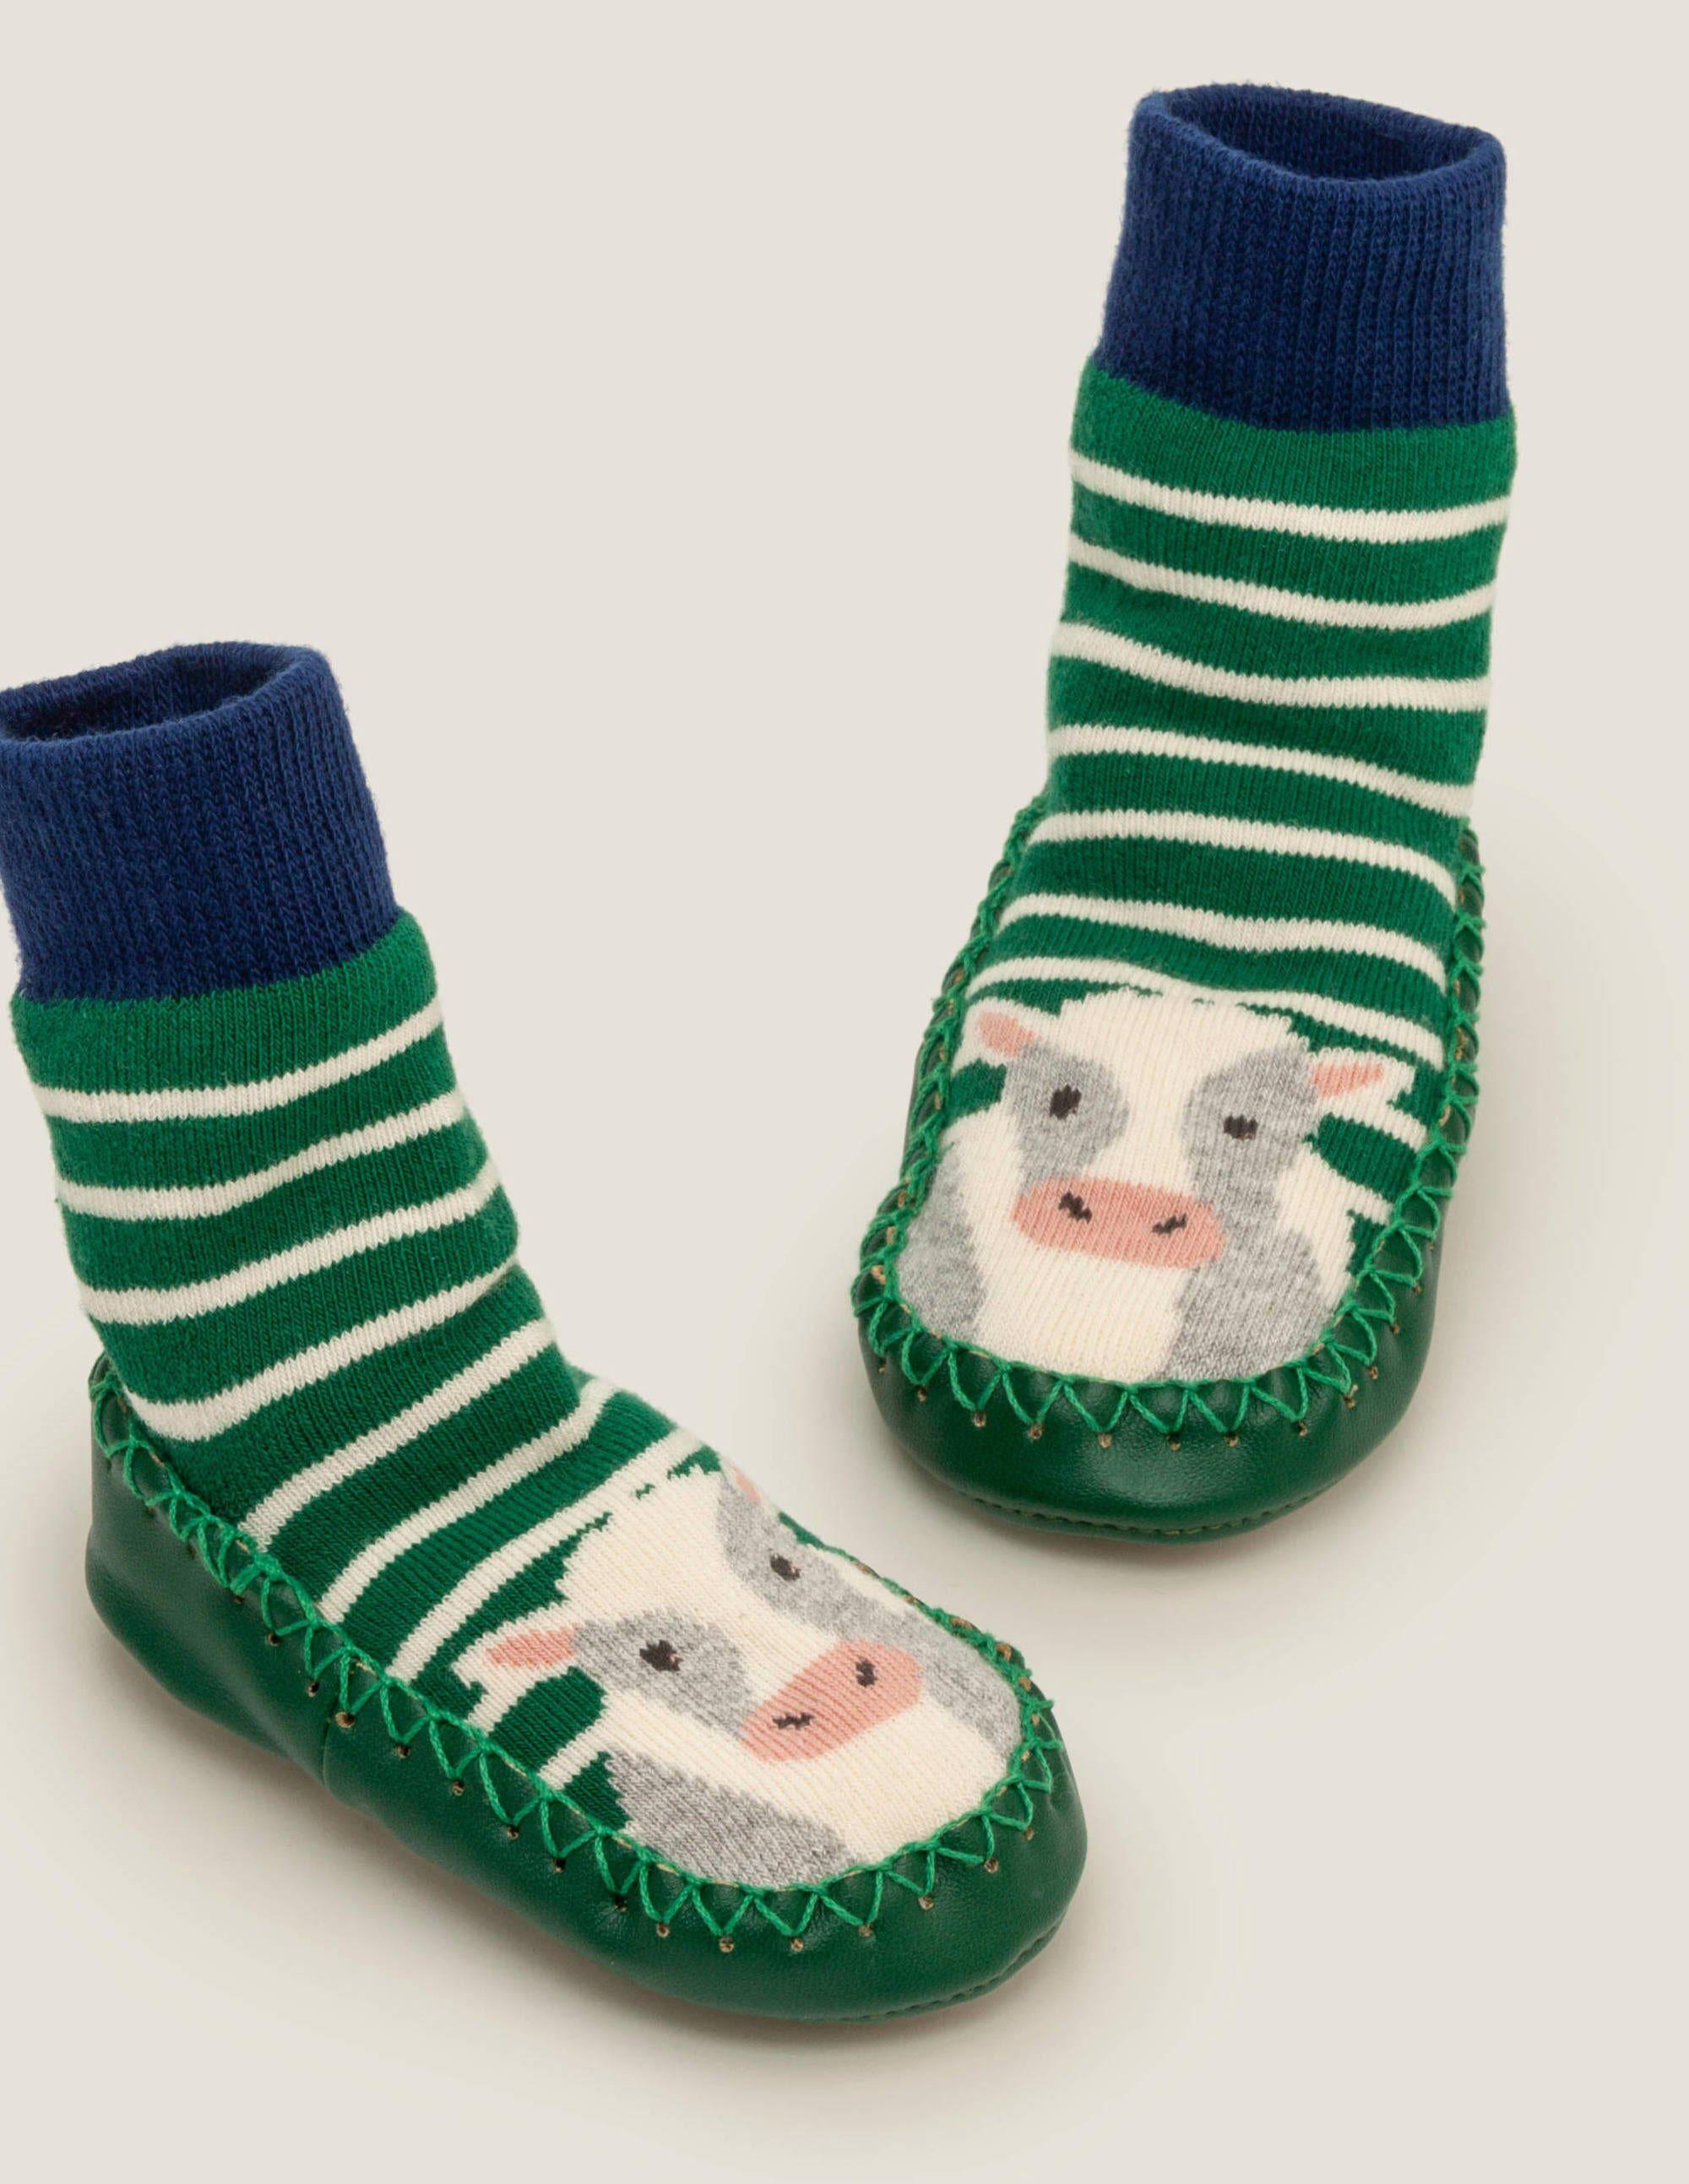 Boden Chaussettes style chaussons JAD Bébé Boden, Green - 12-24m